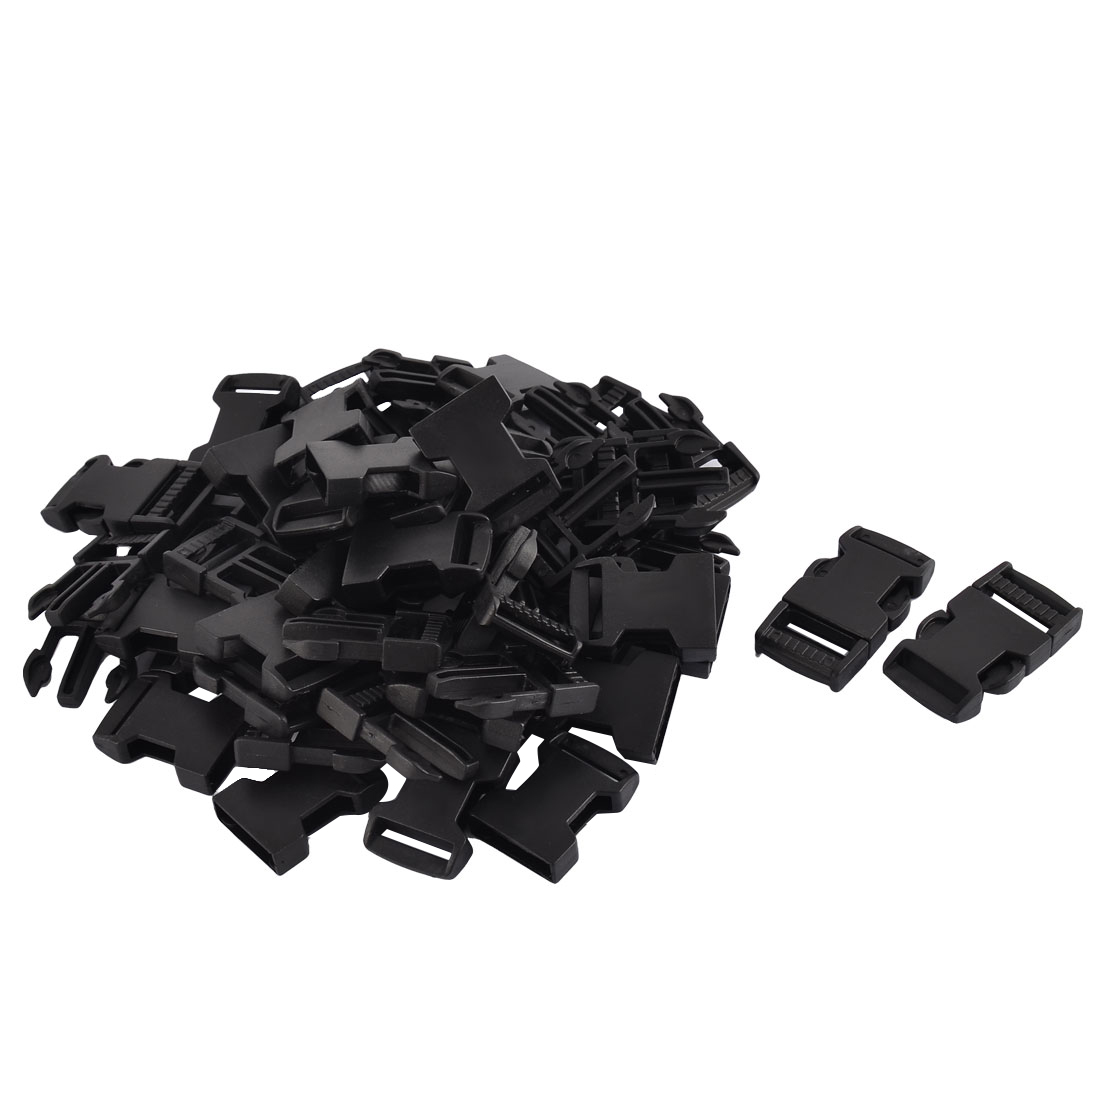 Suitcase Bag Webbing Strap Plastic Side Quick Release Buckle Black 20mm 30pcs